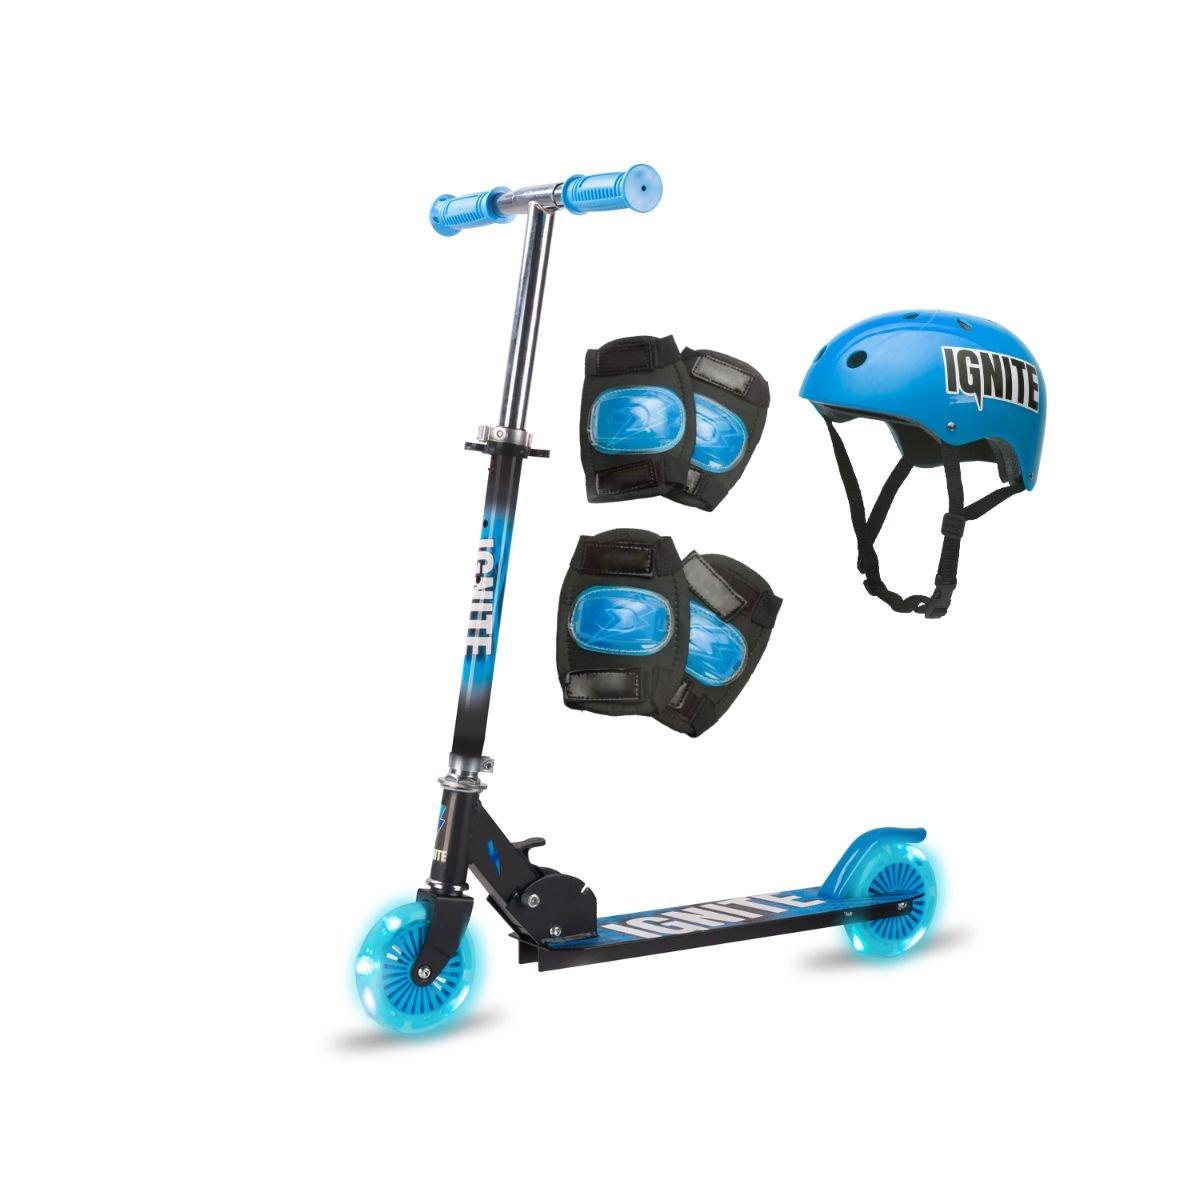 Trotineta pliabila cu 2 roti si echipament de protectie Ignite, Albastru